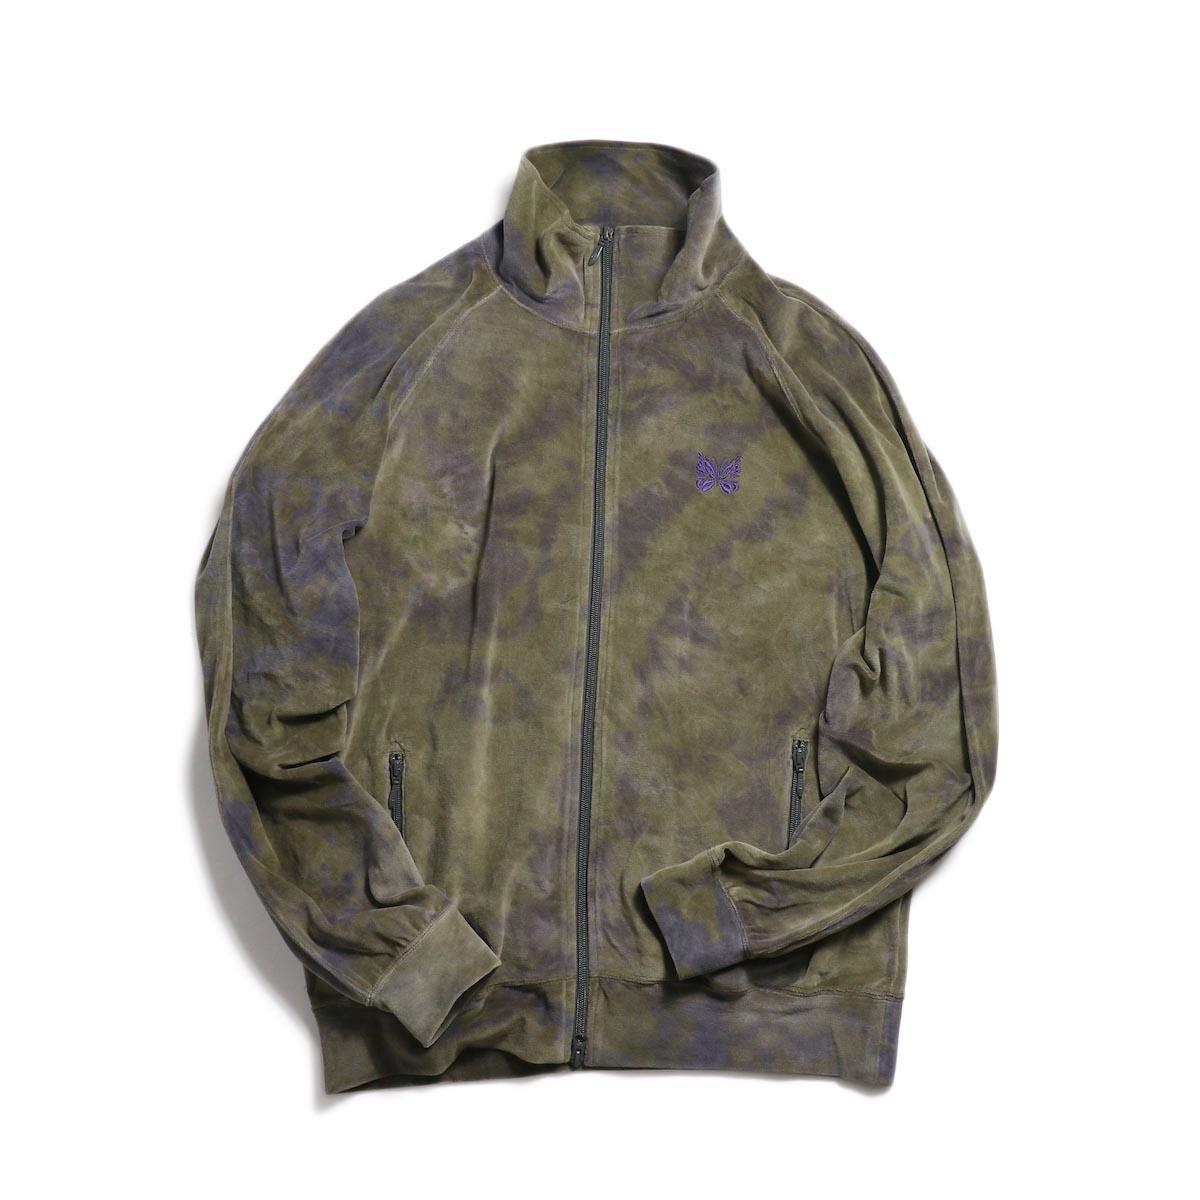 Needles / Track Jacket - C/Poly Velour / Uneven Dye (Olive)